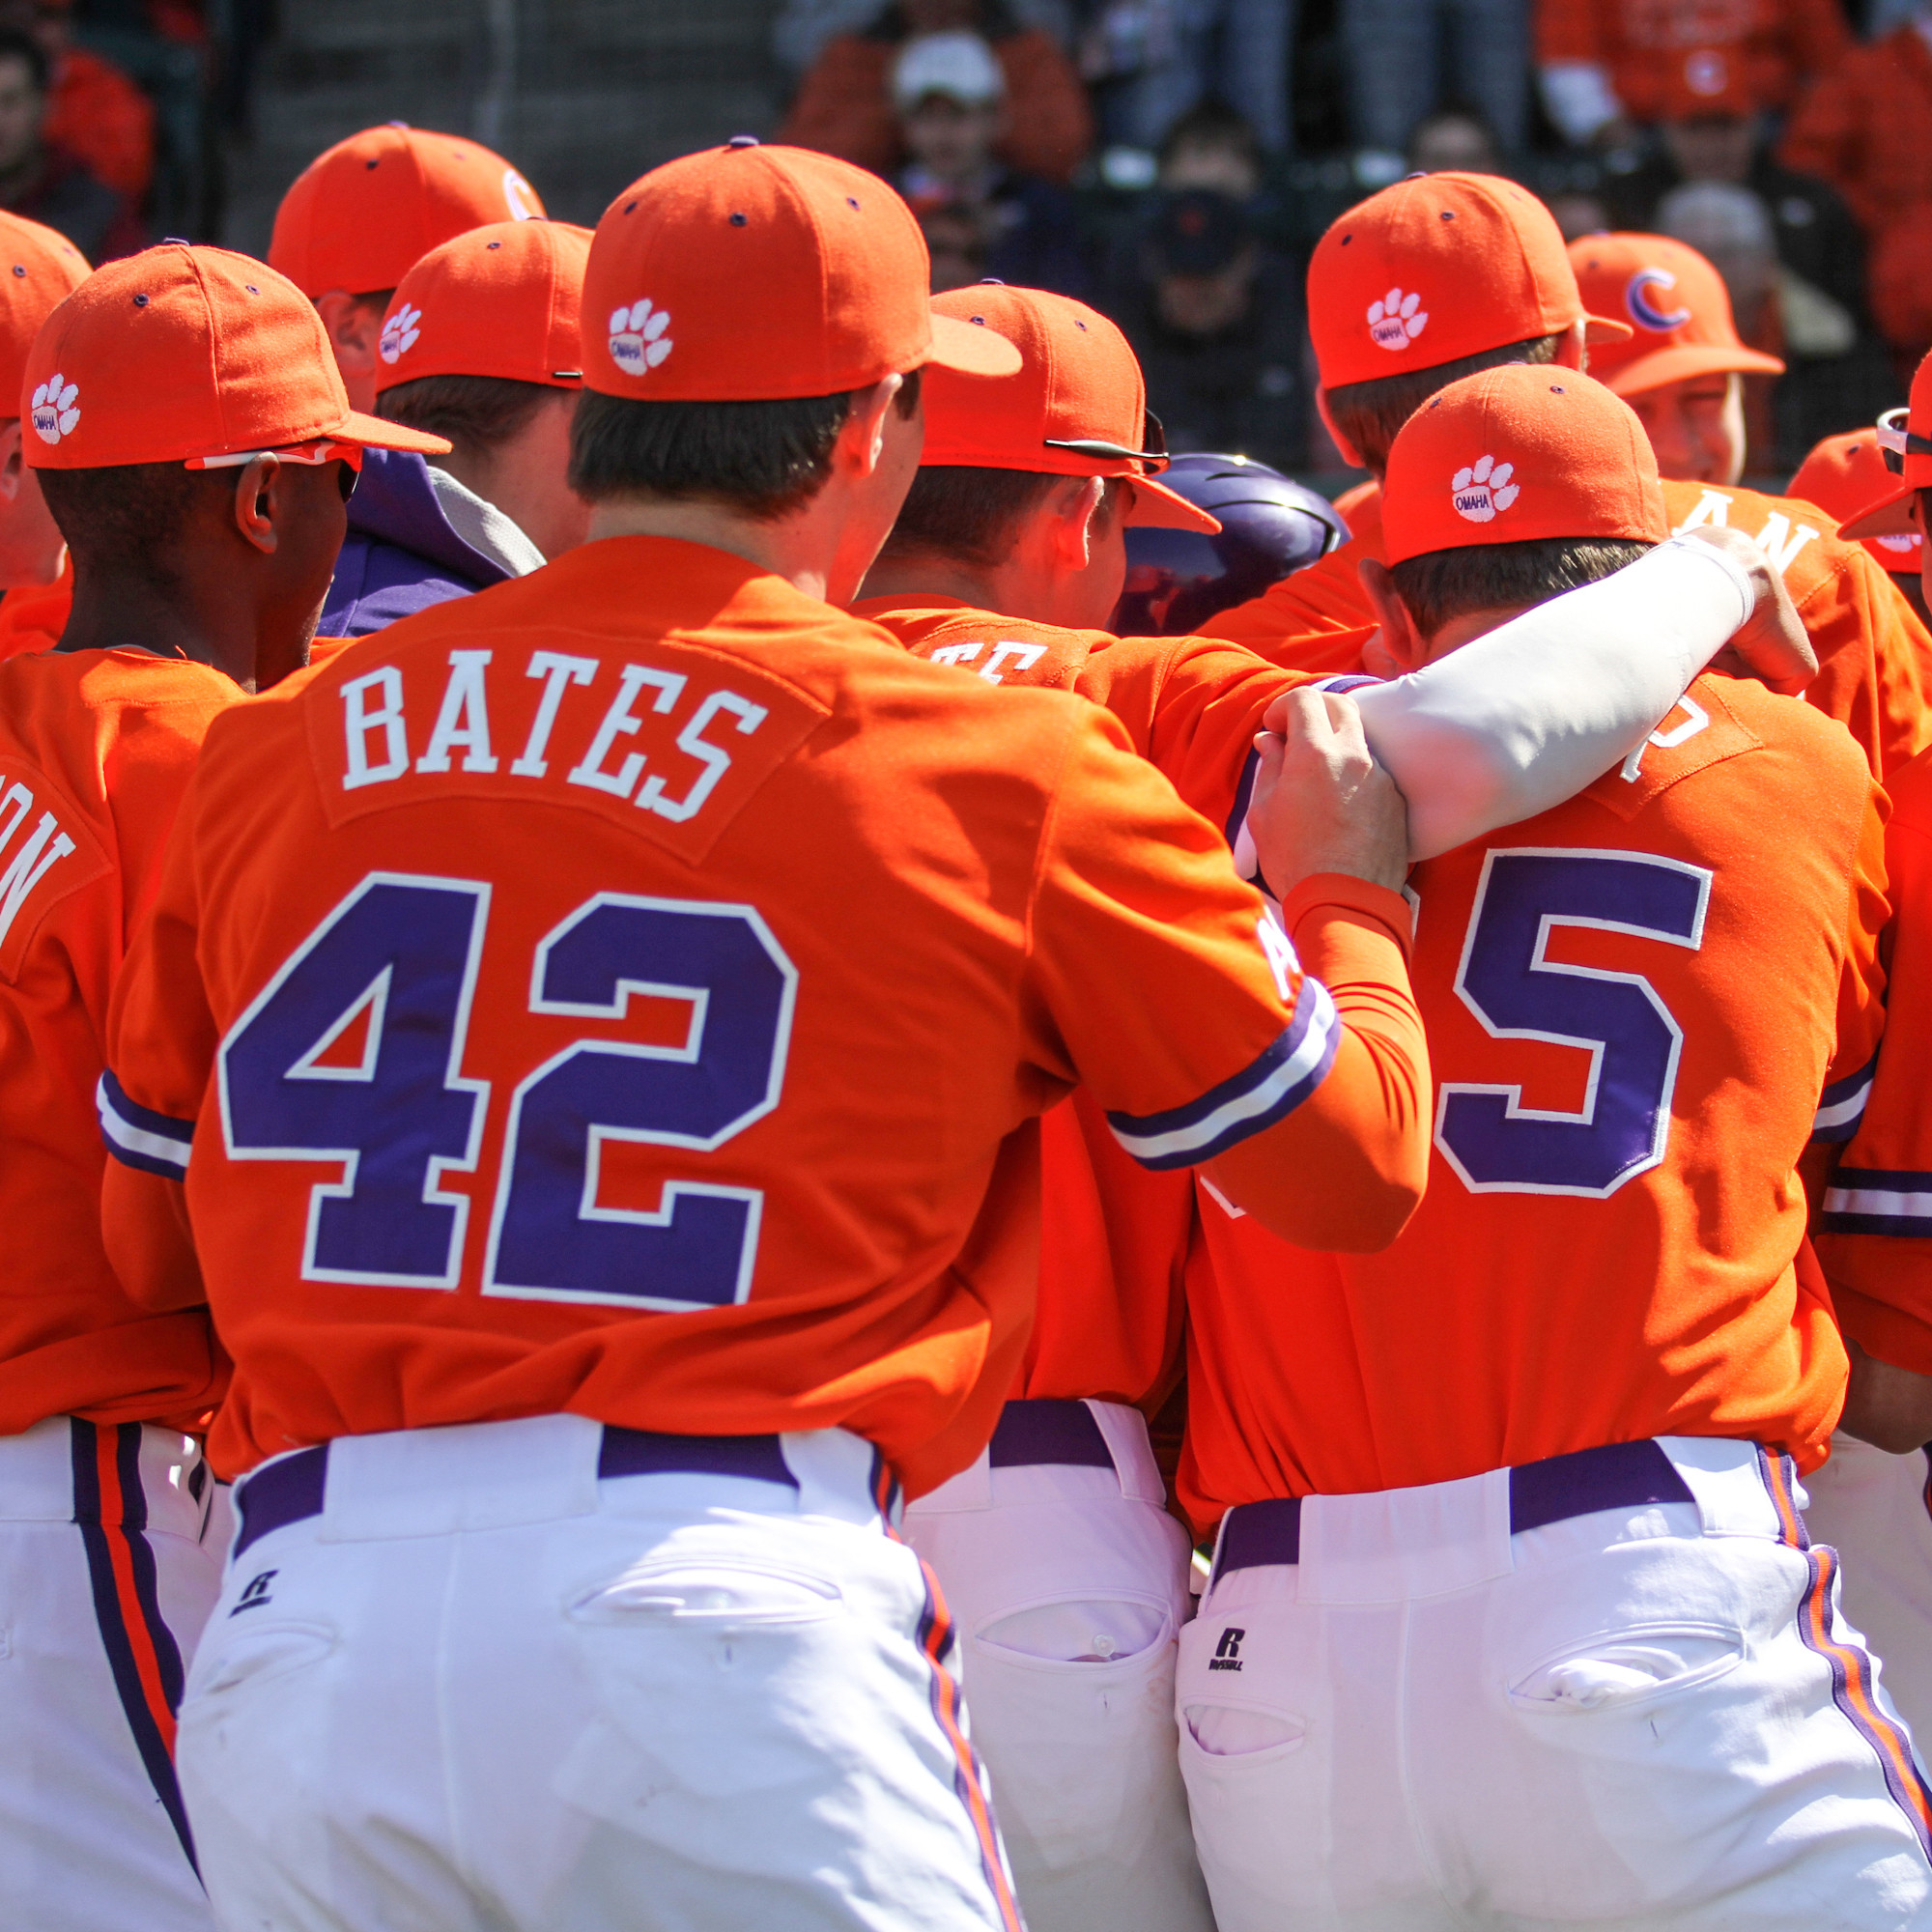 Tigers No. 24 in Baseball America Preseason Ranking